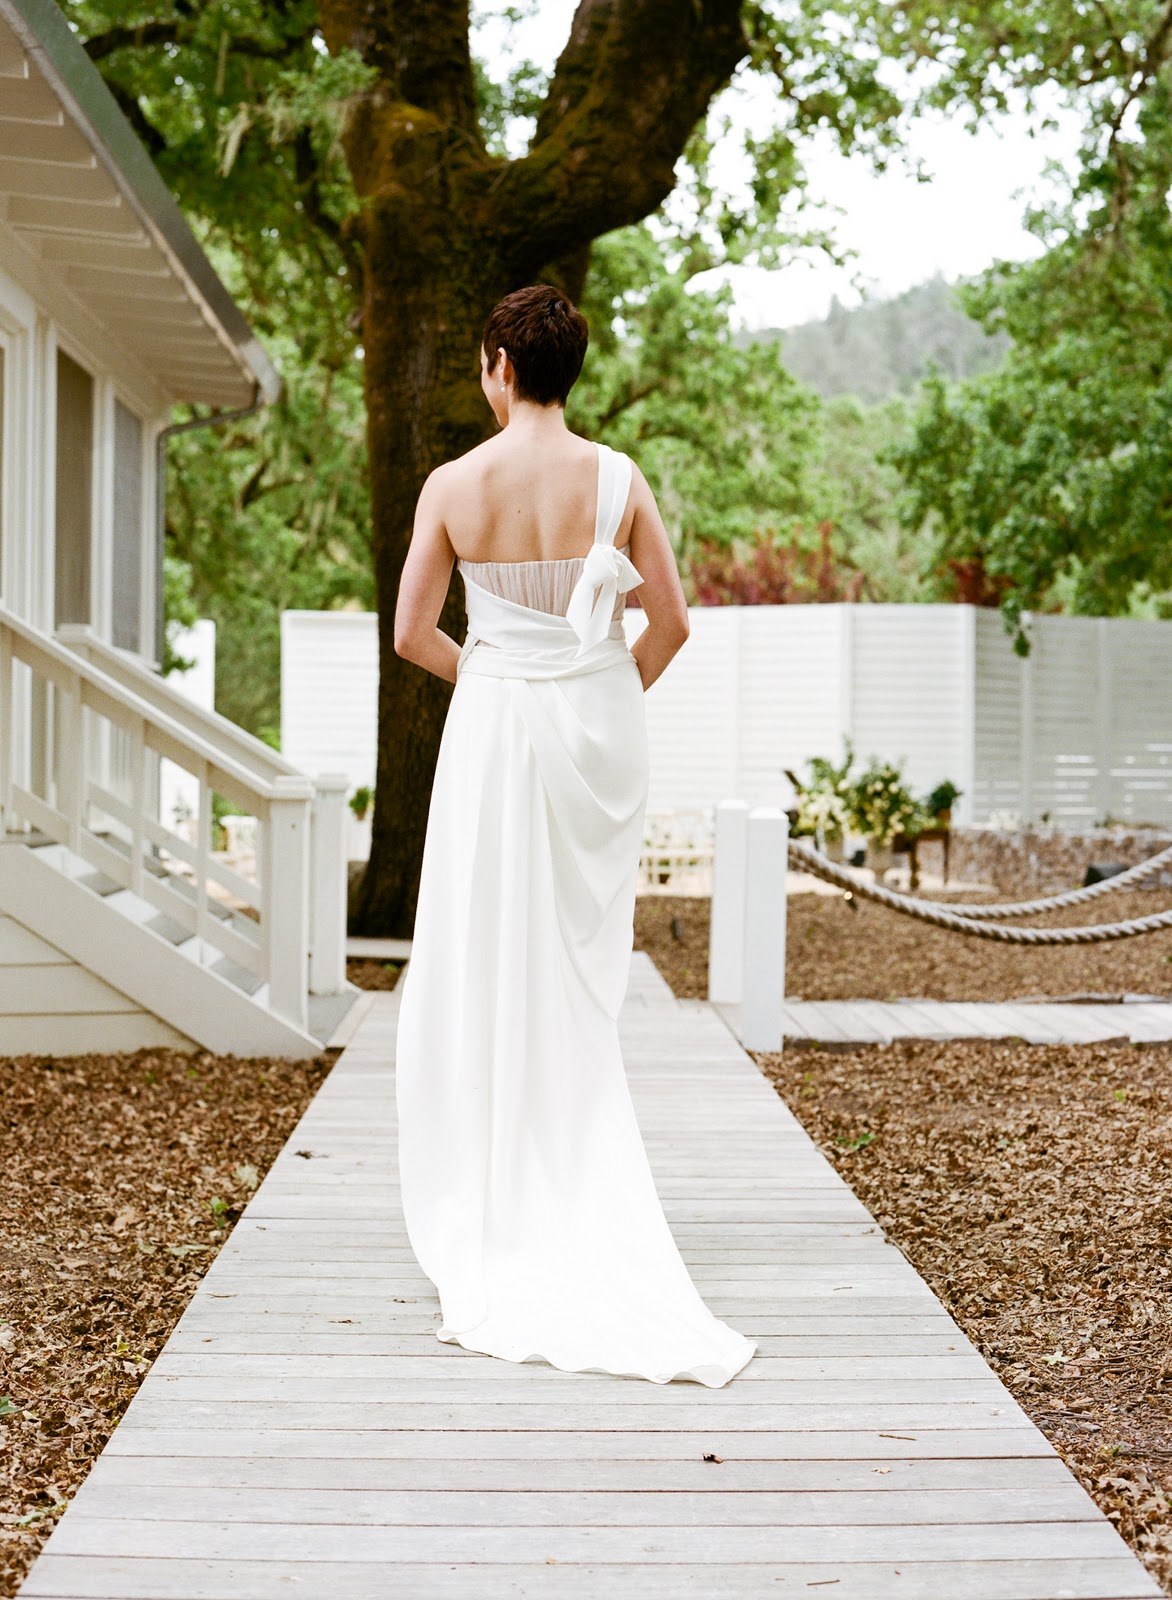 sylvie-gil-film-photography-wedding-durham-ranch-dress-bride